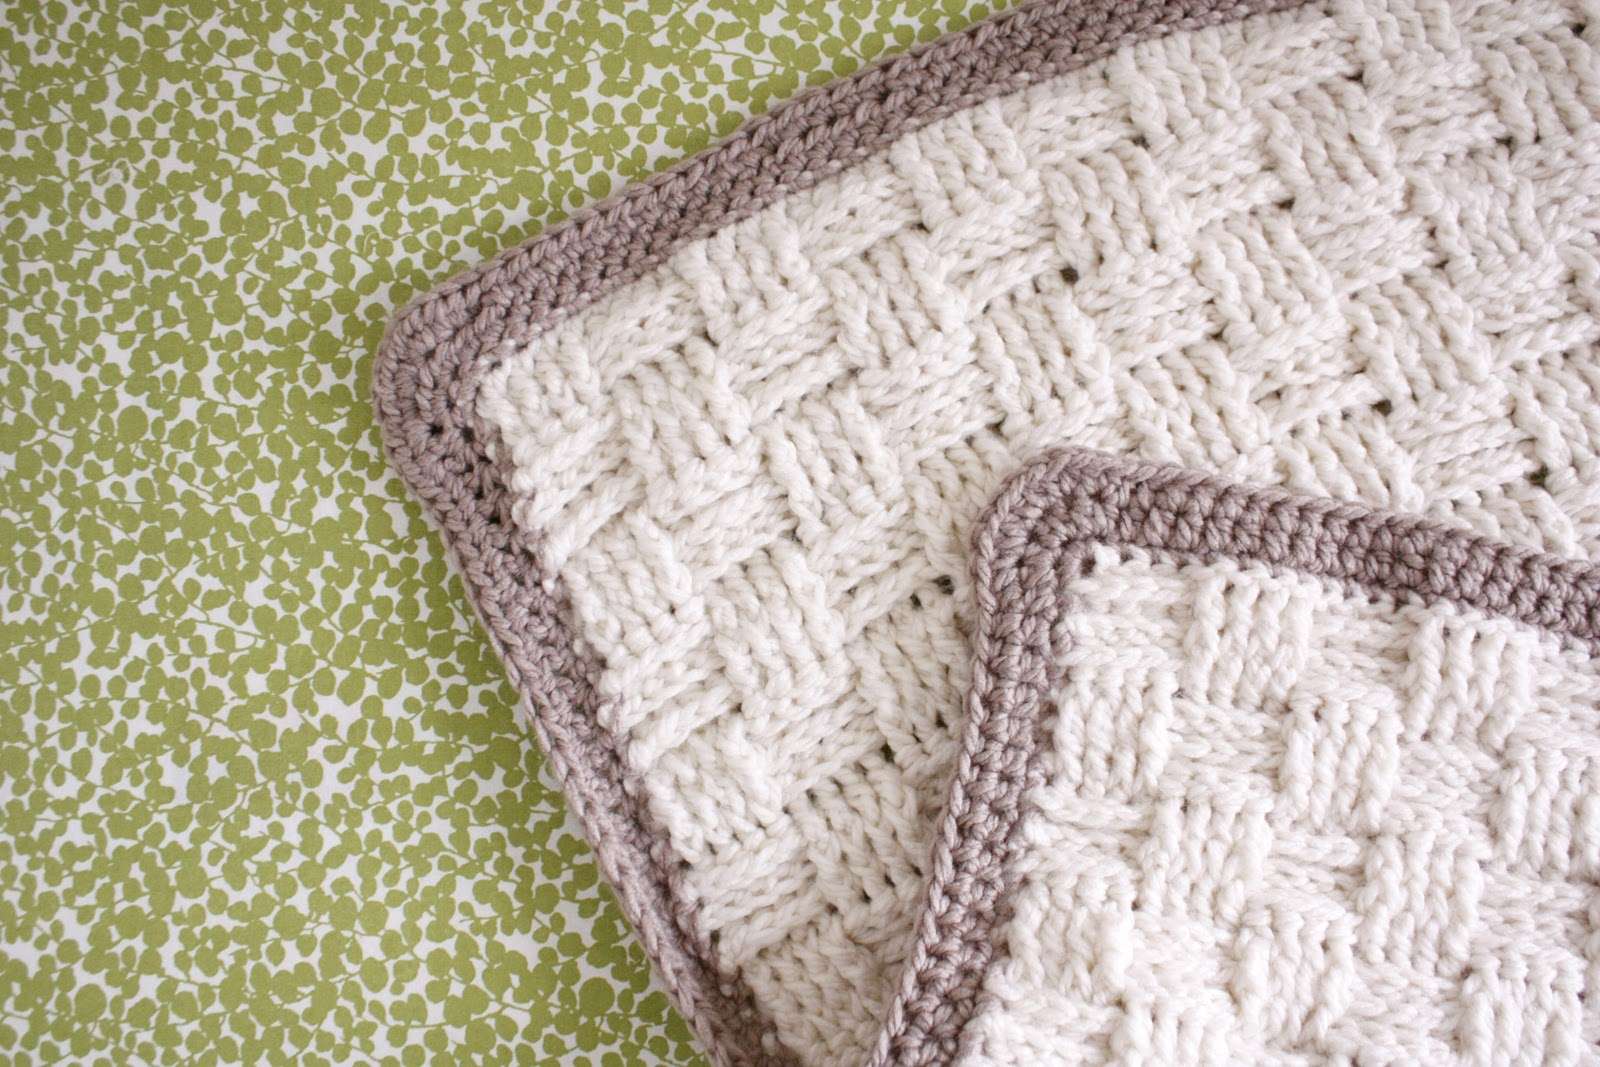 Basket Weave Knitting Pattern Baby Blanket : Nesting basket weave crochet baby blanket